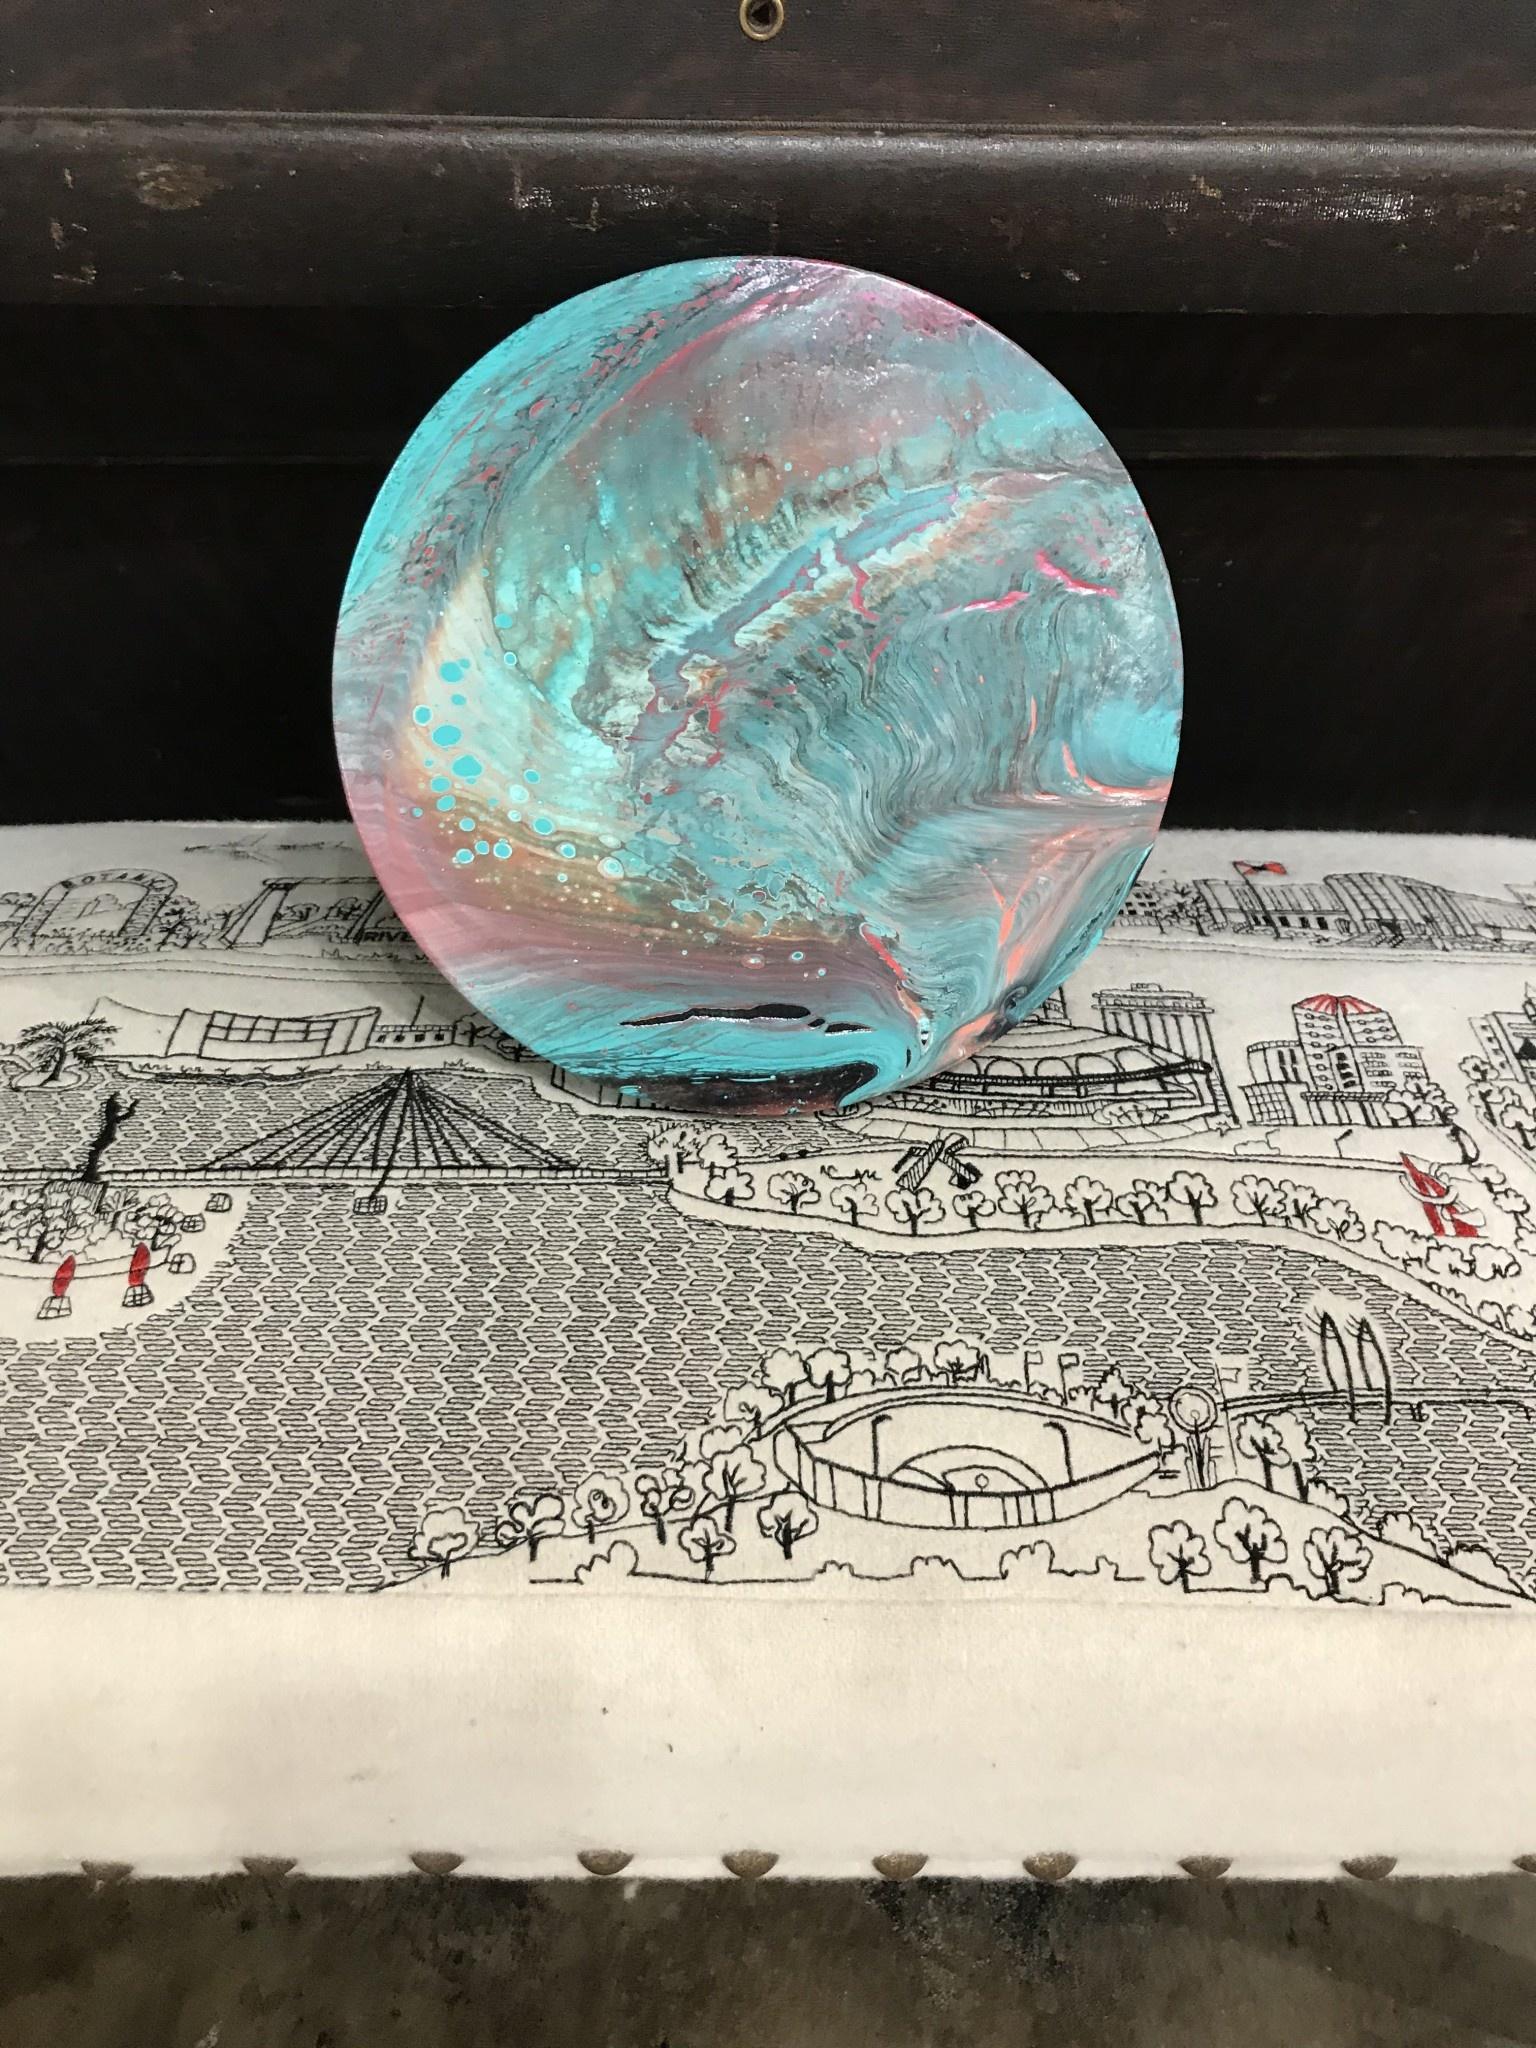 "Acrylic Creations By Jessica Kilpatric Acrylic Creations 10"" Round"